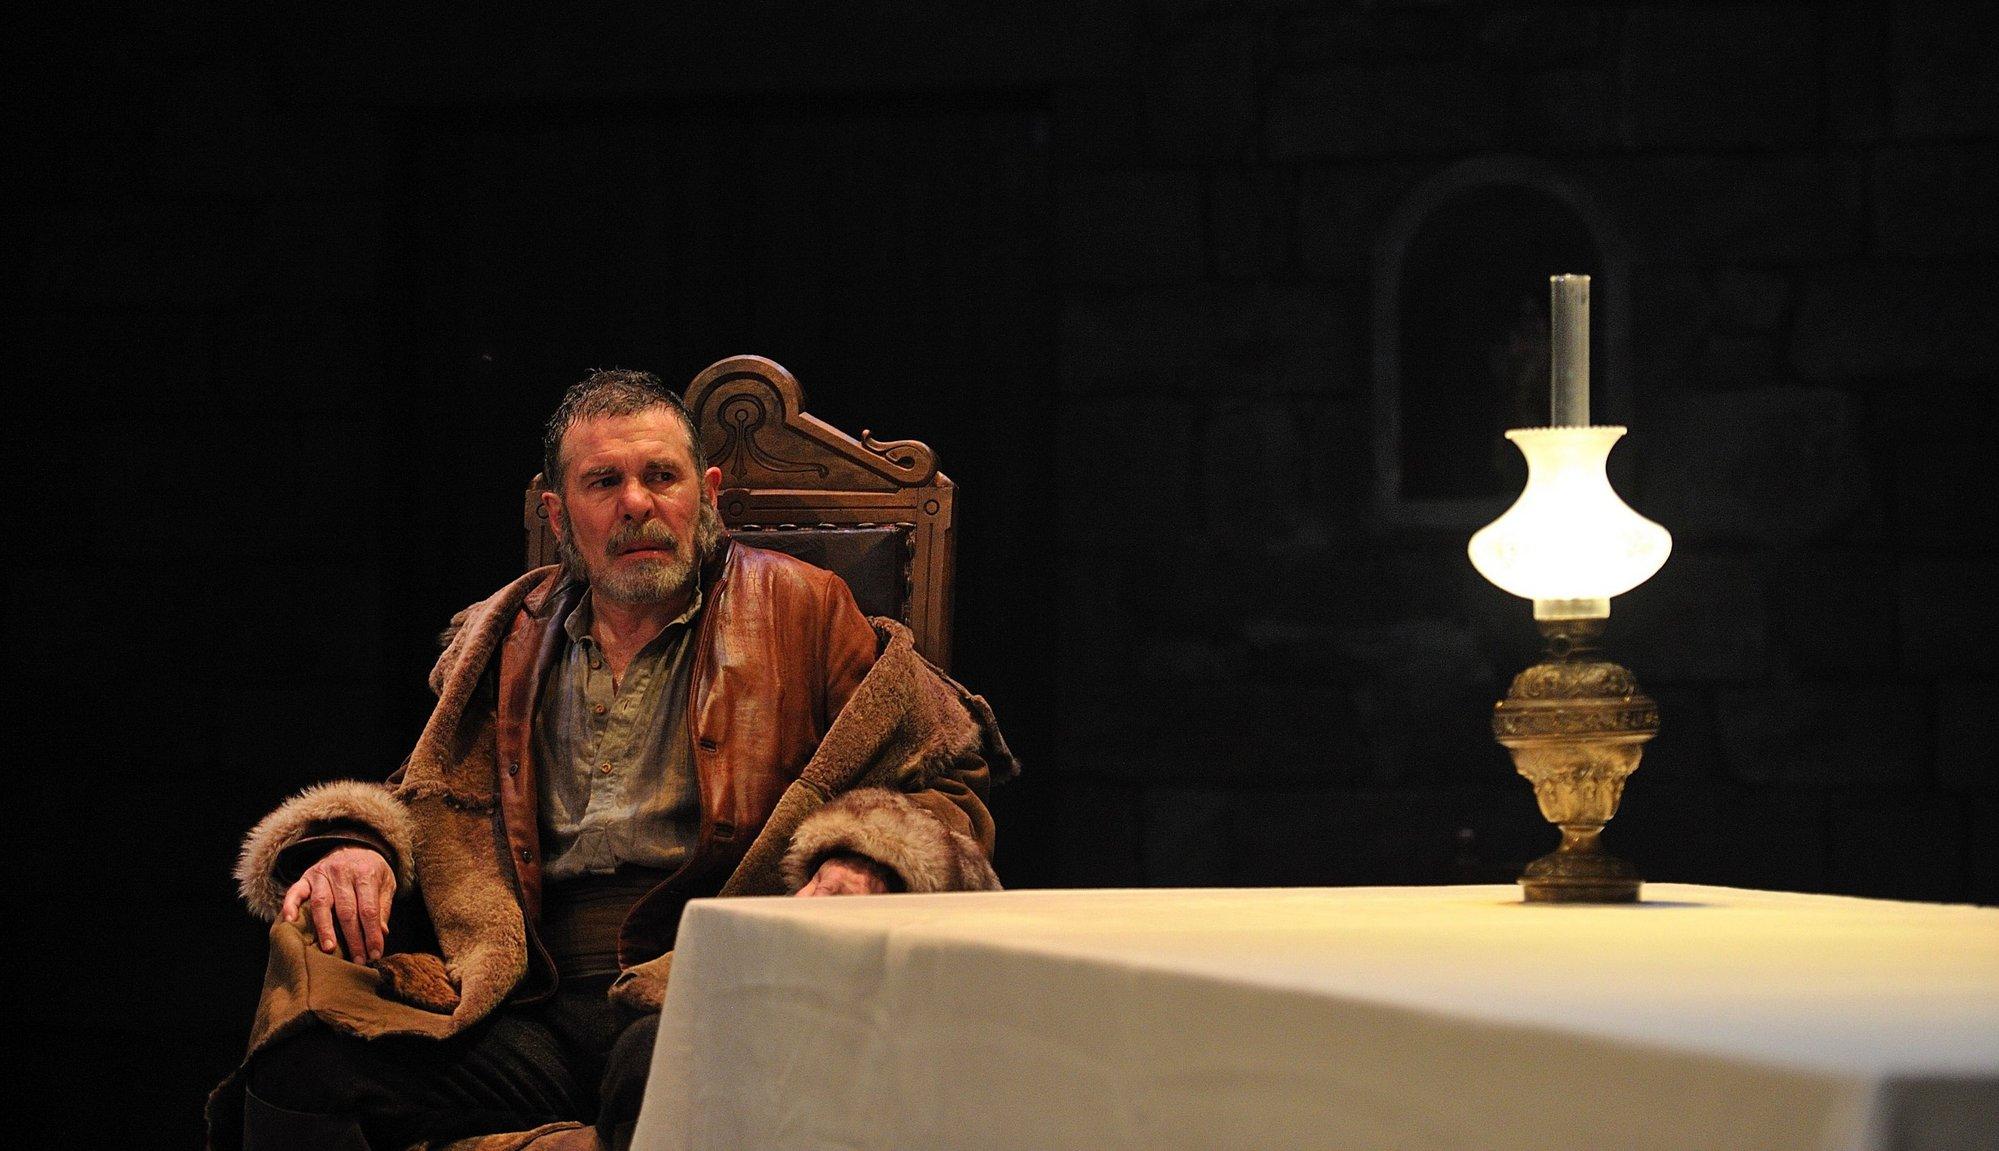 Teatro Nacional de Cataluña estrena »Rei i Senyor» de Josep Pous i Pagès, un drama contra el autoritarismo